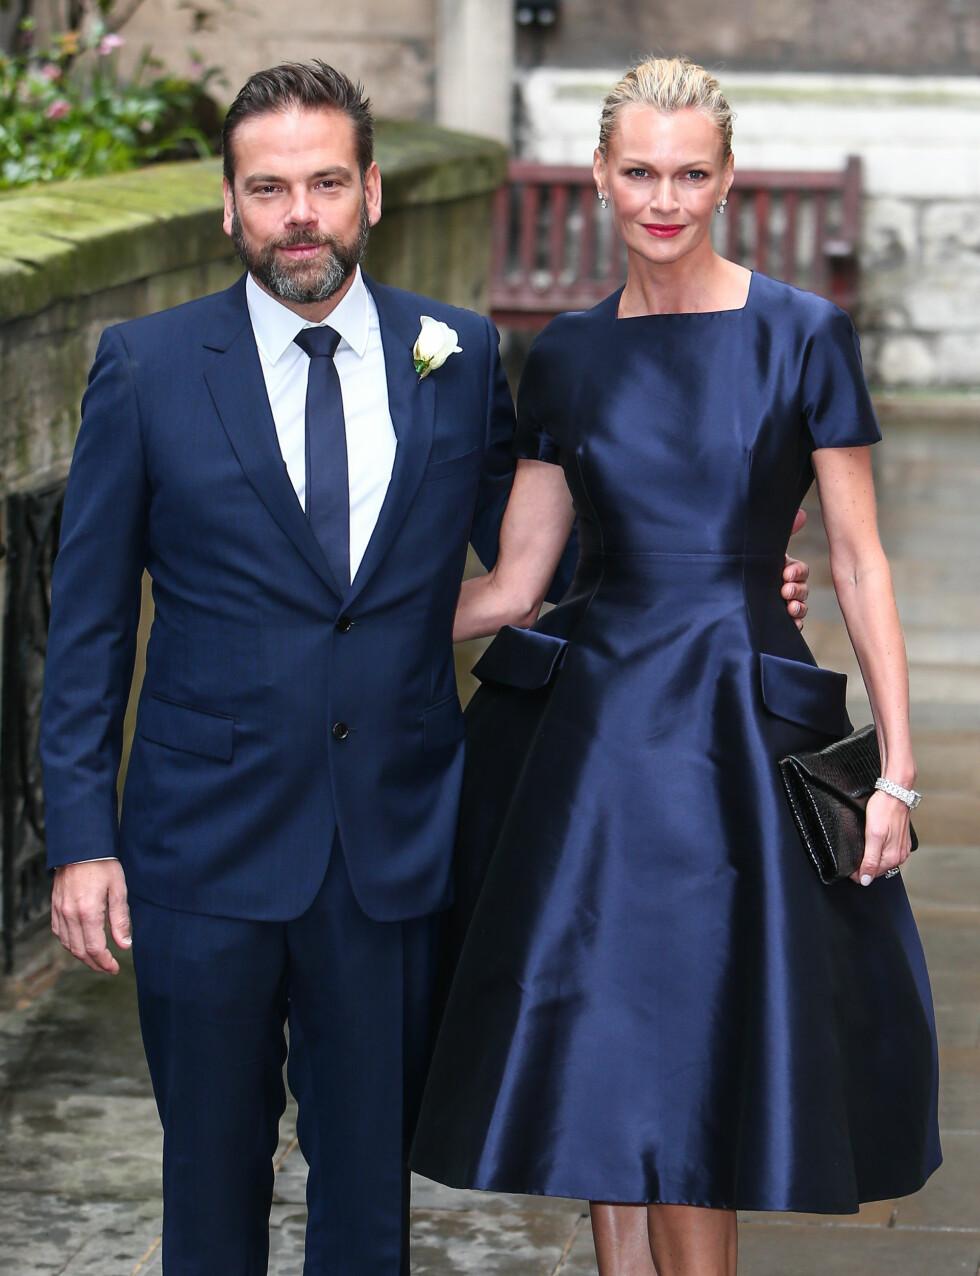 TOK MED KONA: Rupert Murdochs sønn Lachlat og kona Sarah. Foto: wenn.com